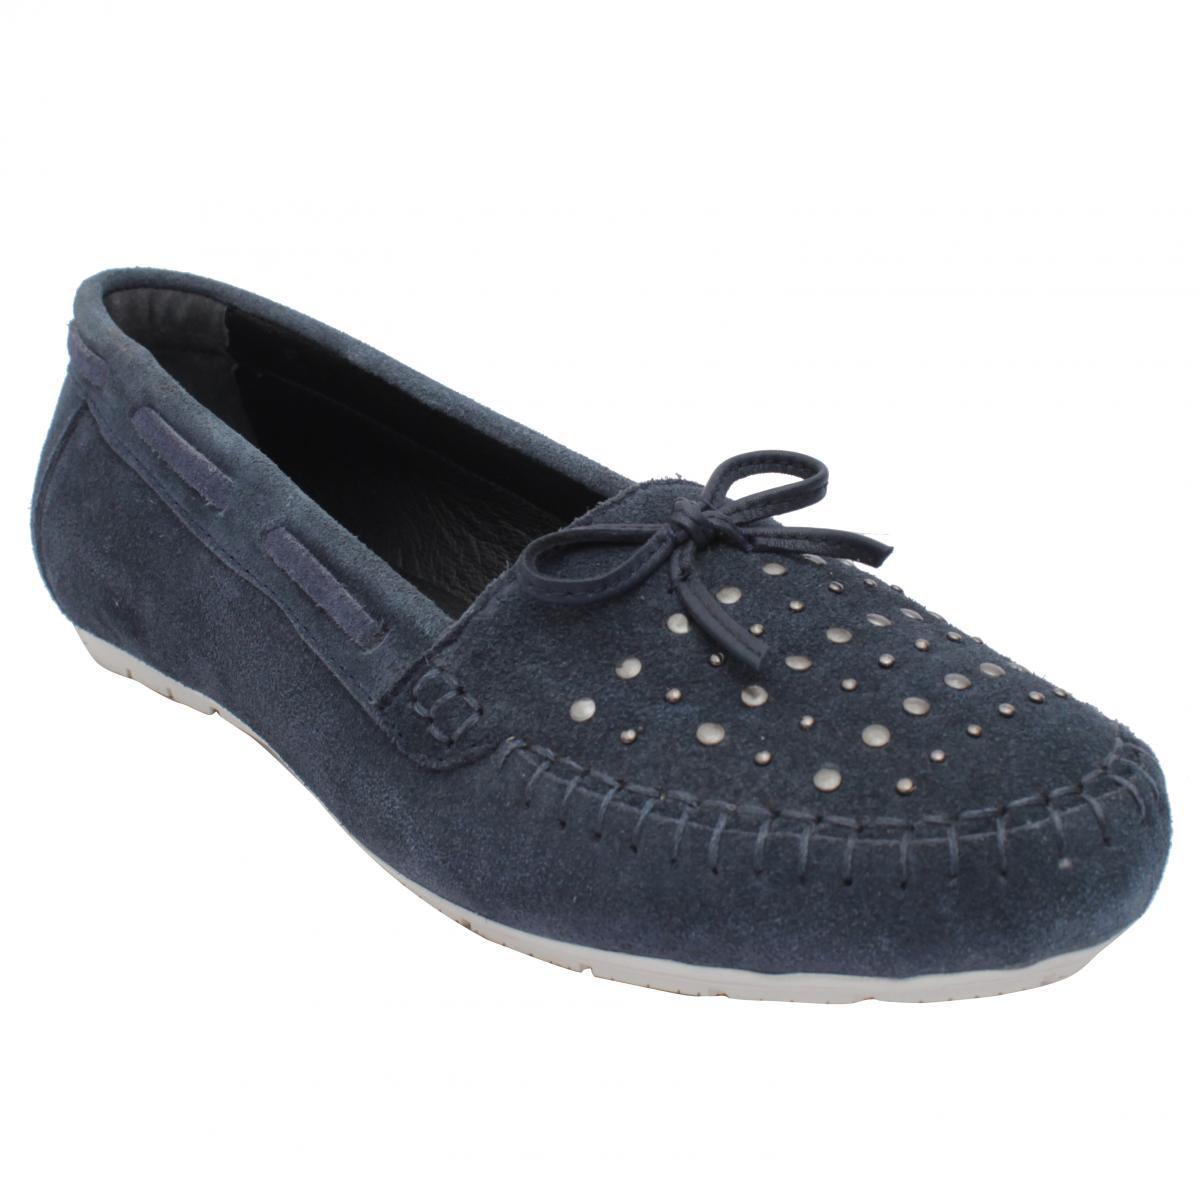 Salt N Pepper Navy Casual Shoes